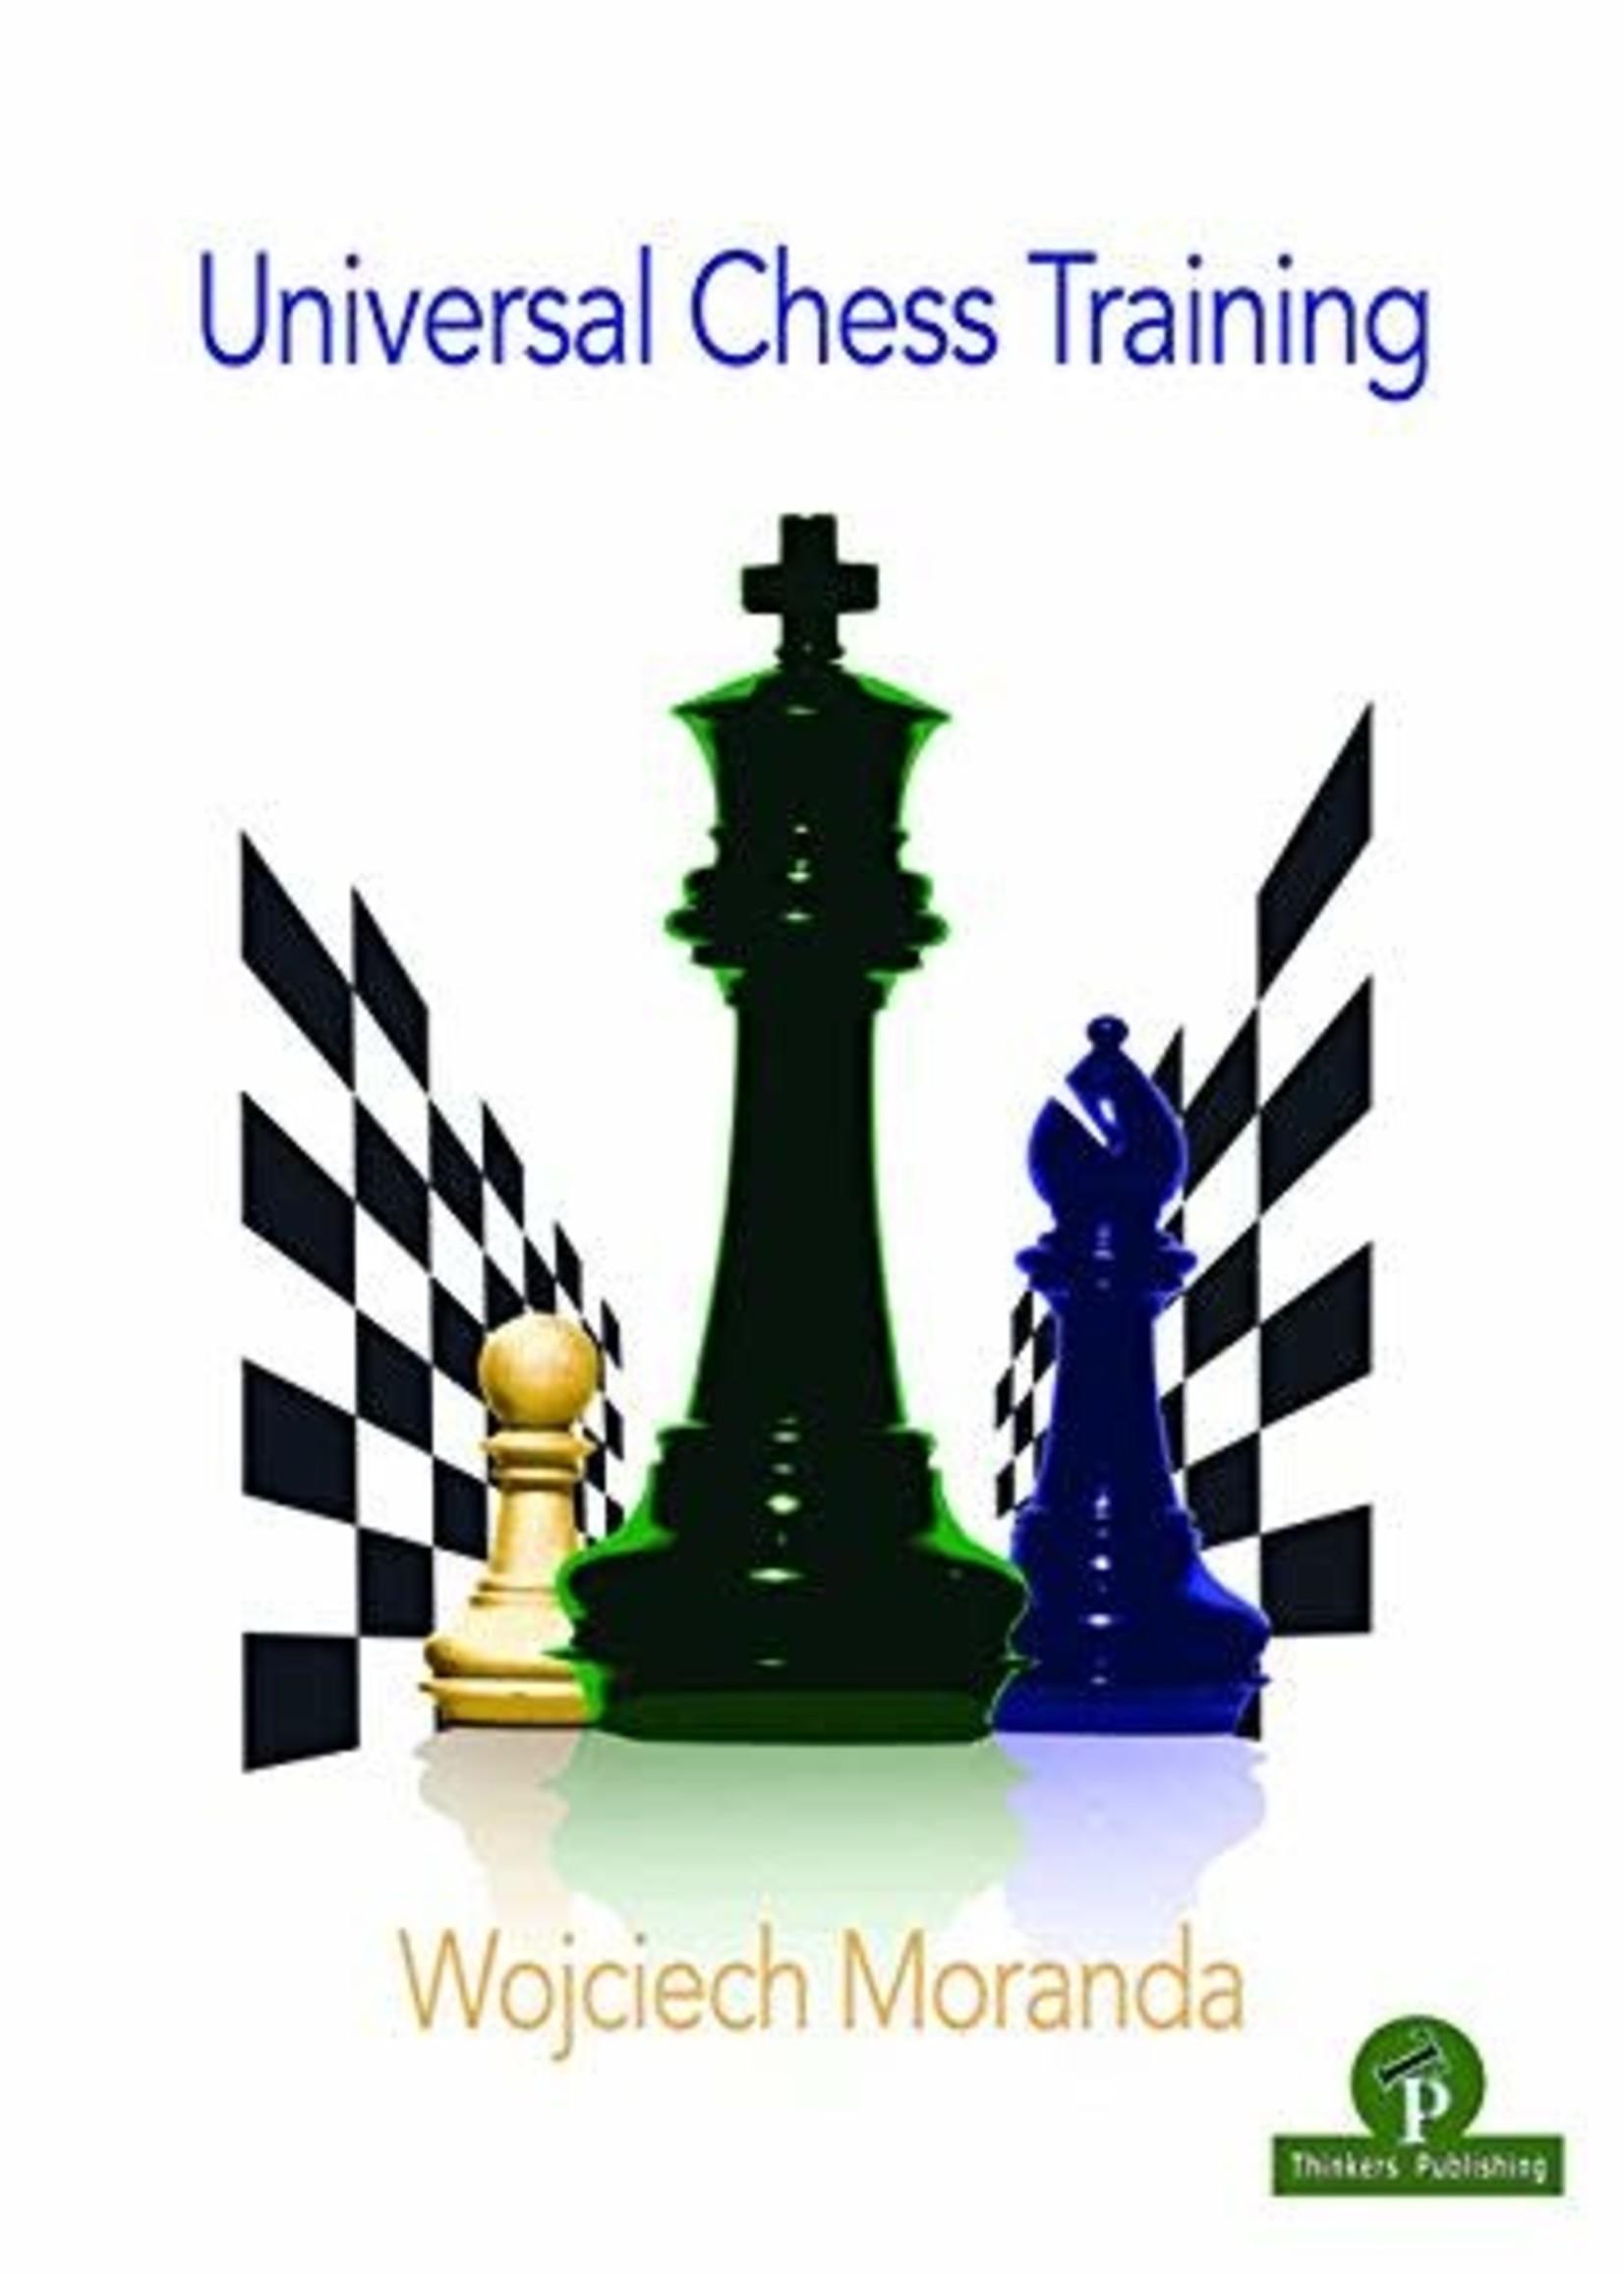 Thinkers Publishing Moranda - Universal Chess Training